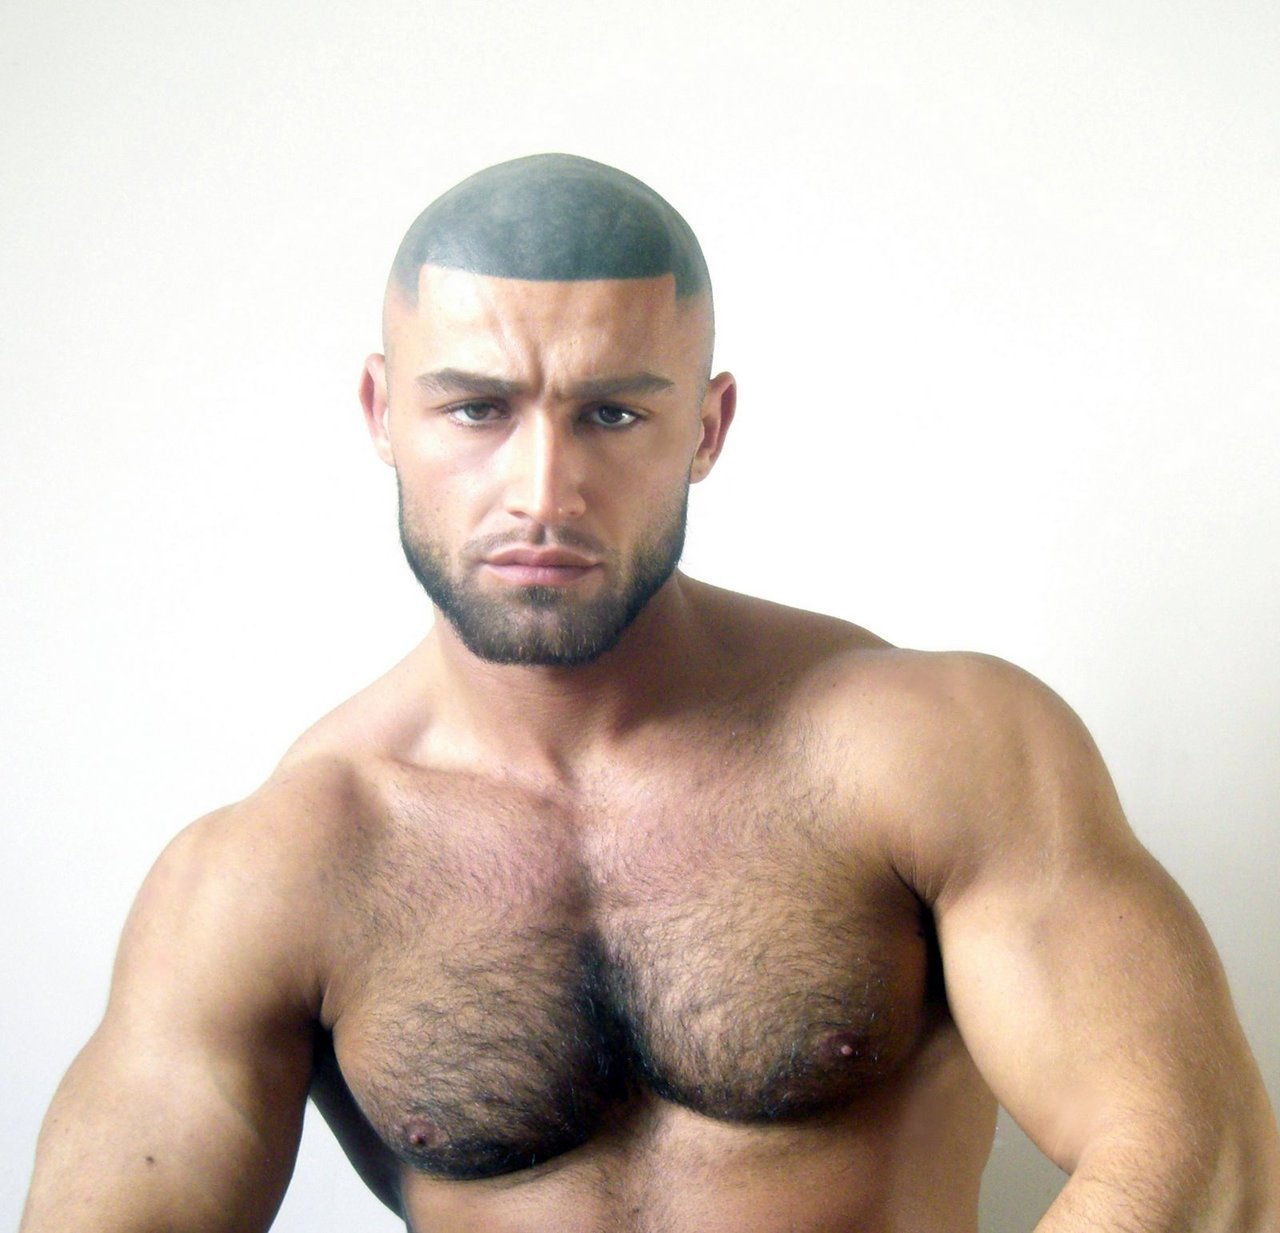 Francois Sagat hot gay daddy dude men porn